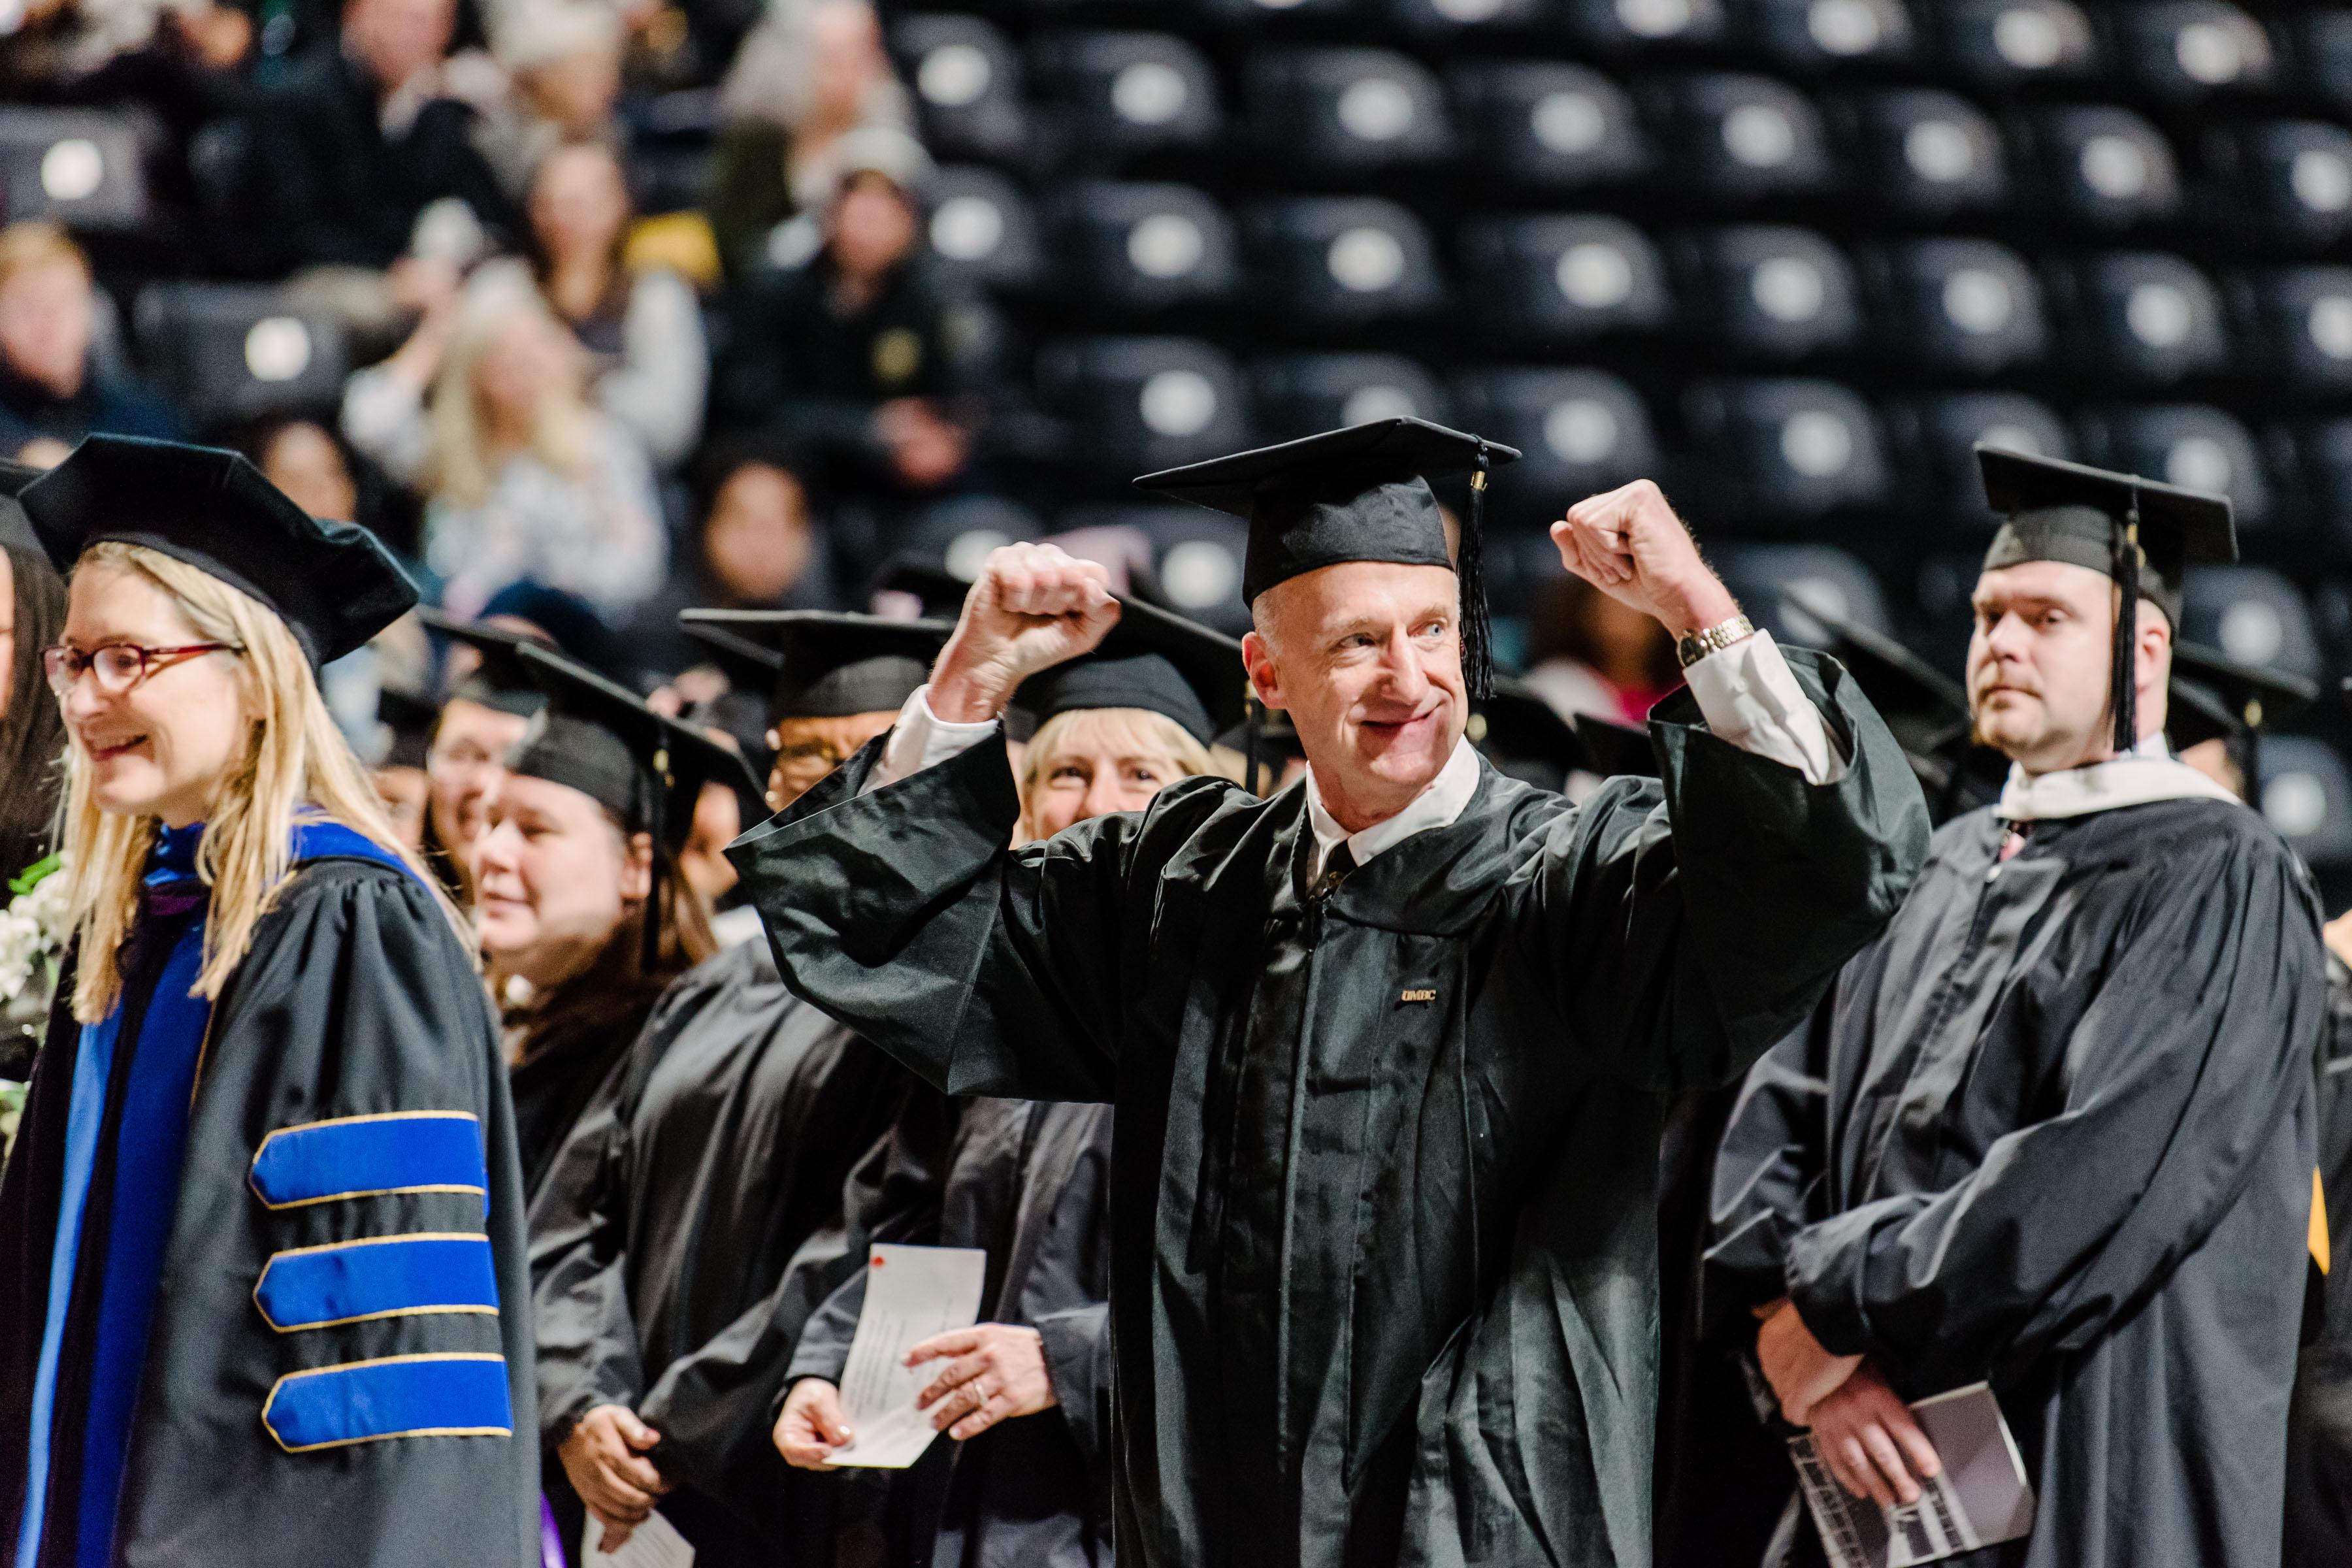 UMBC faculty member celebrates at Graduate Commencement.